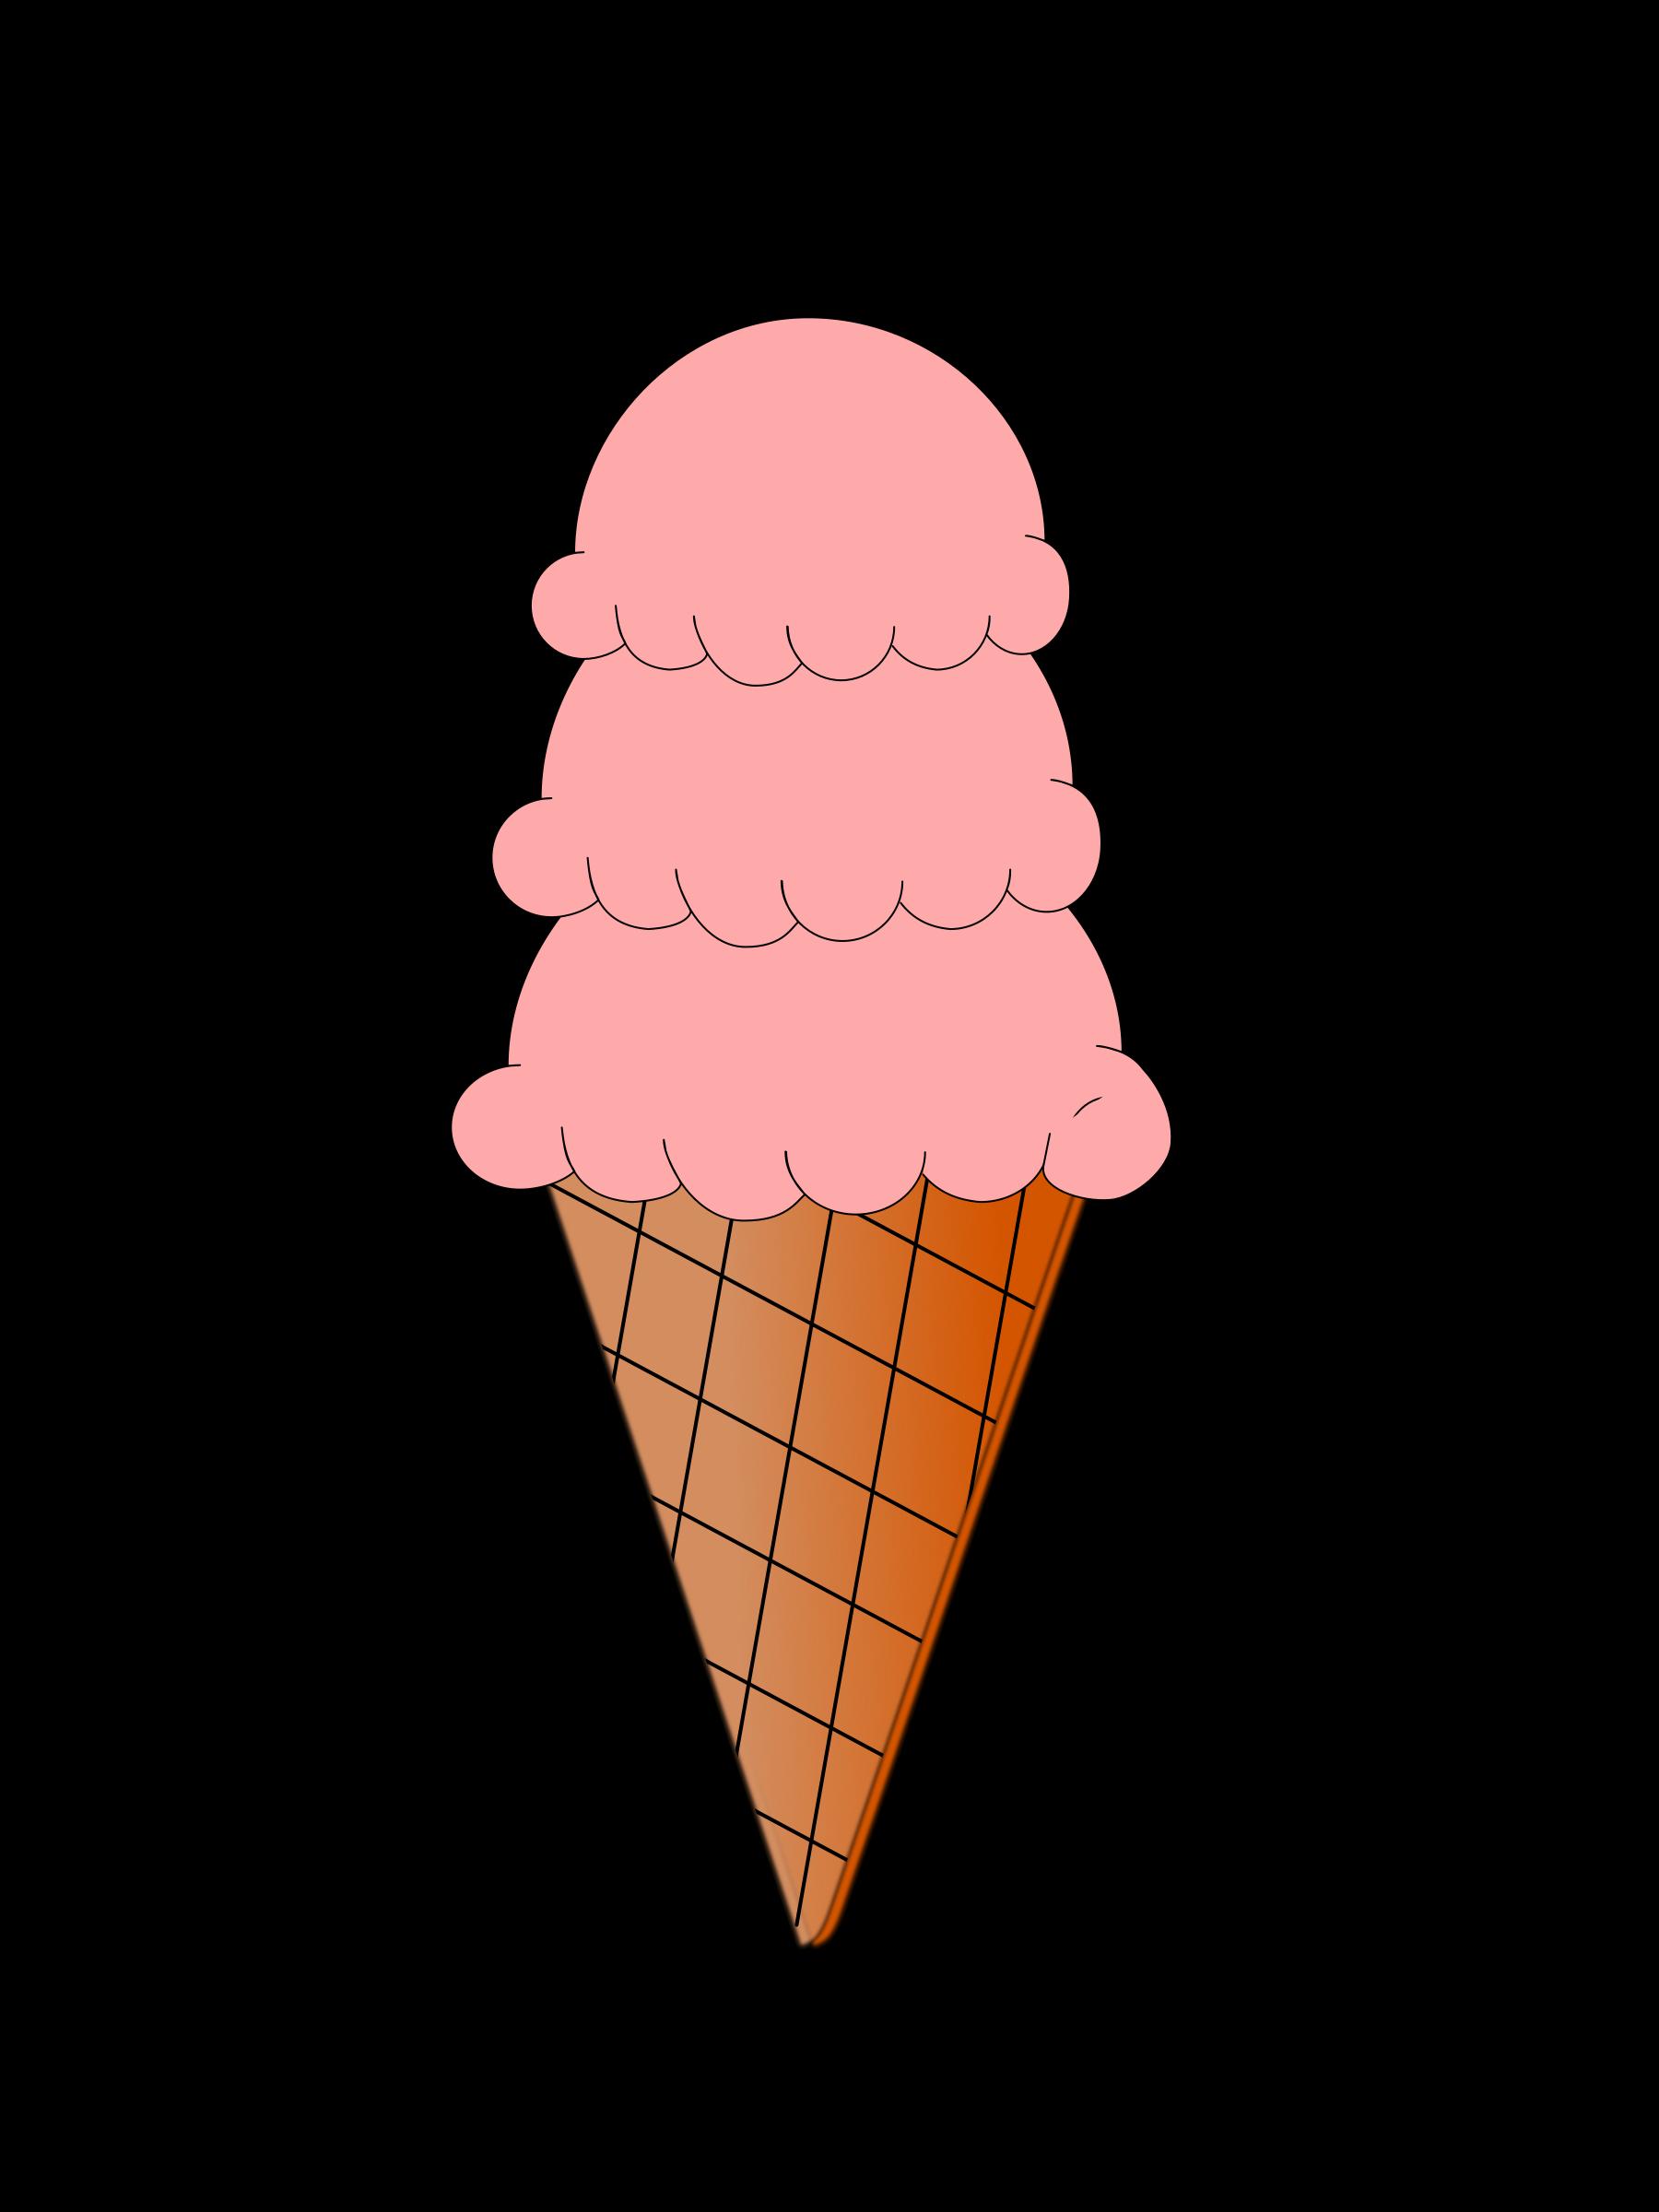 Desserts clipart animation. Ice cream and sugar